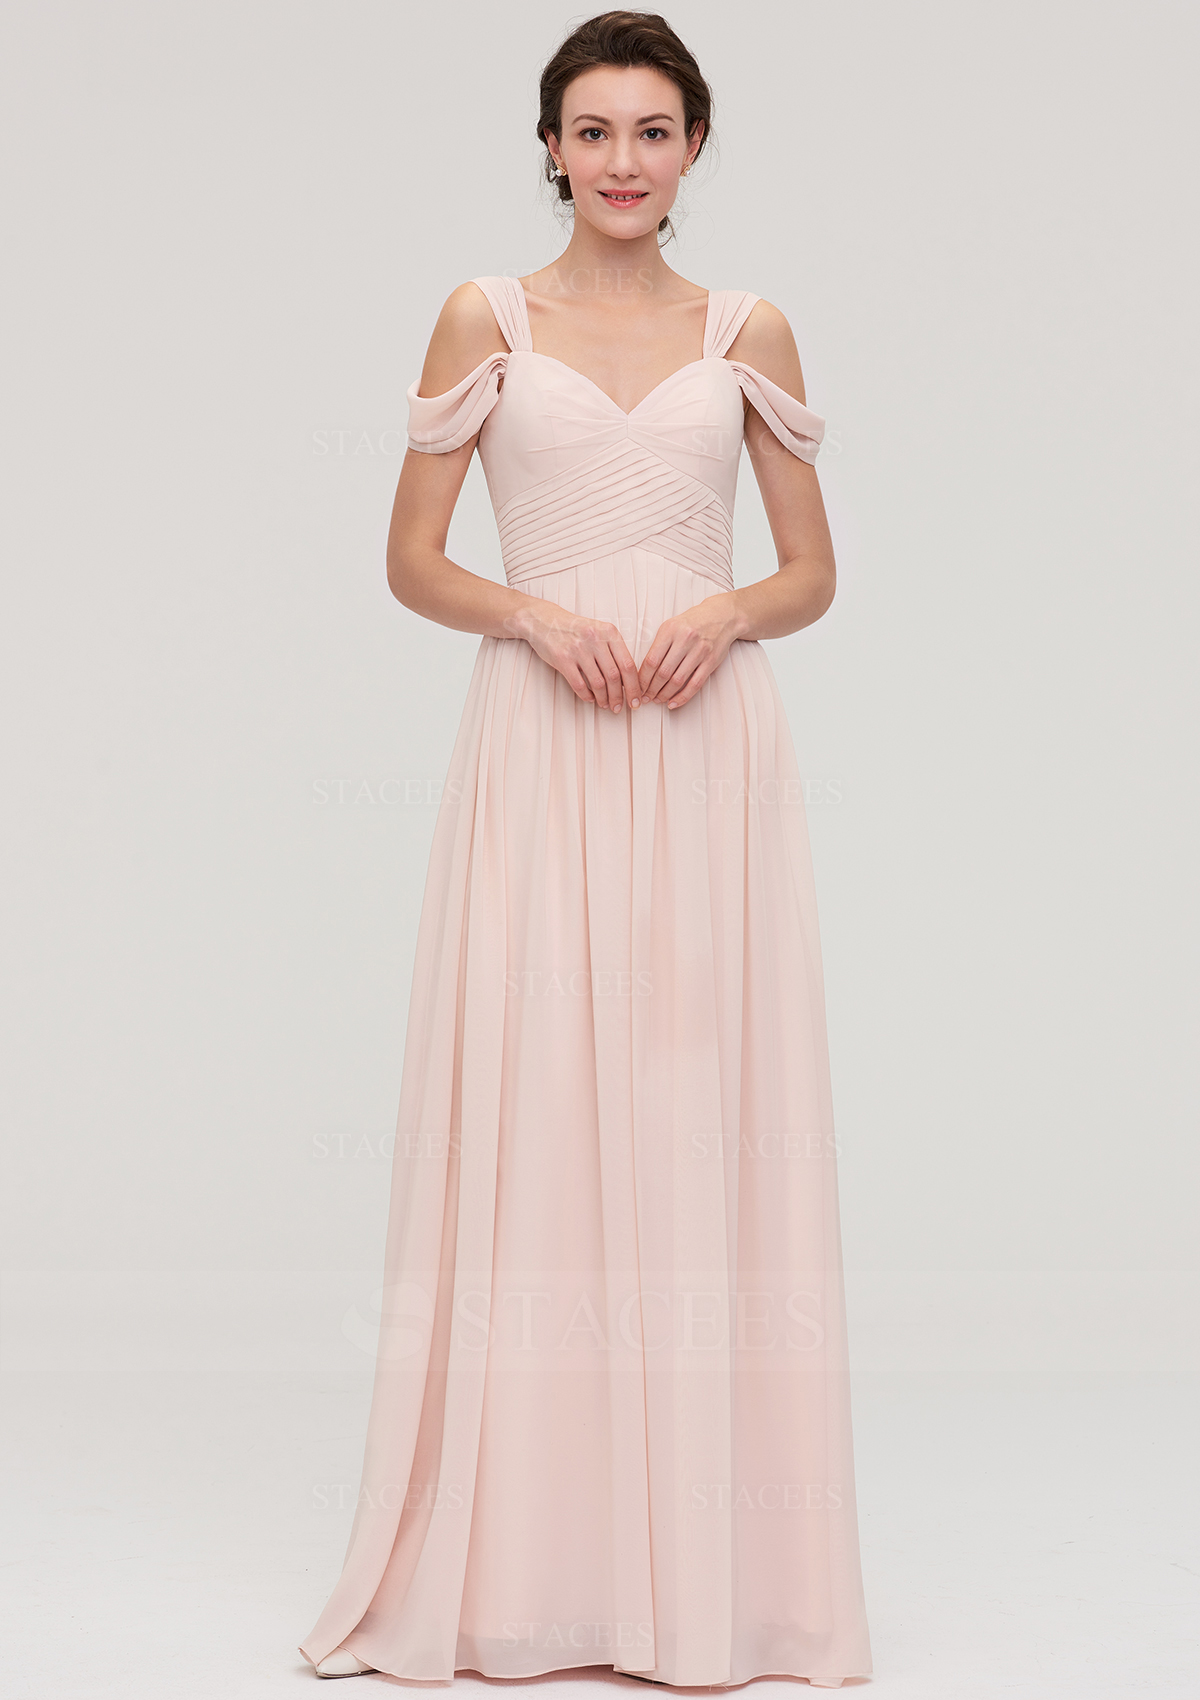 77848028657d A-line/Princess Sweetheart Sleeveless Long/Floor-Length Chiffon ...